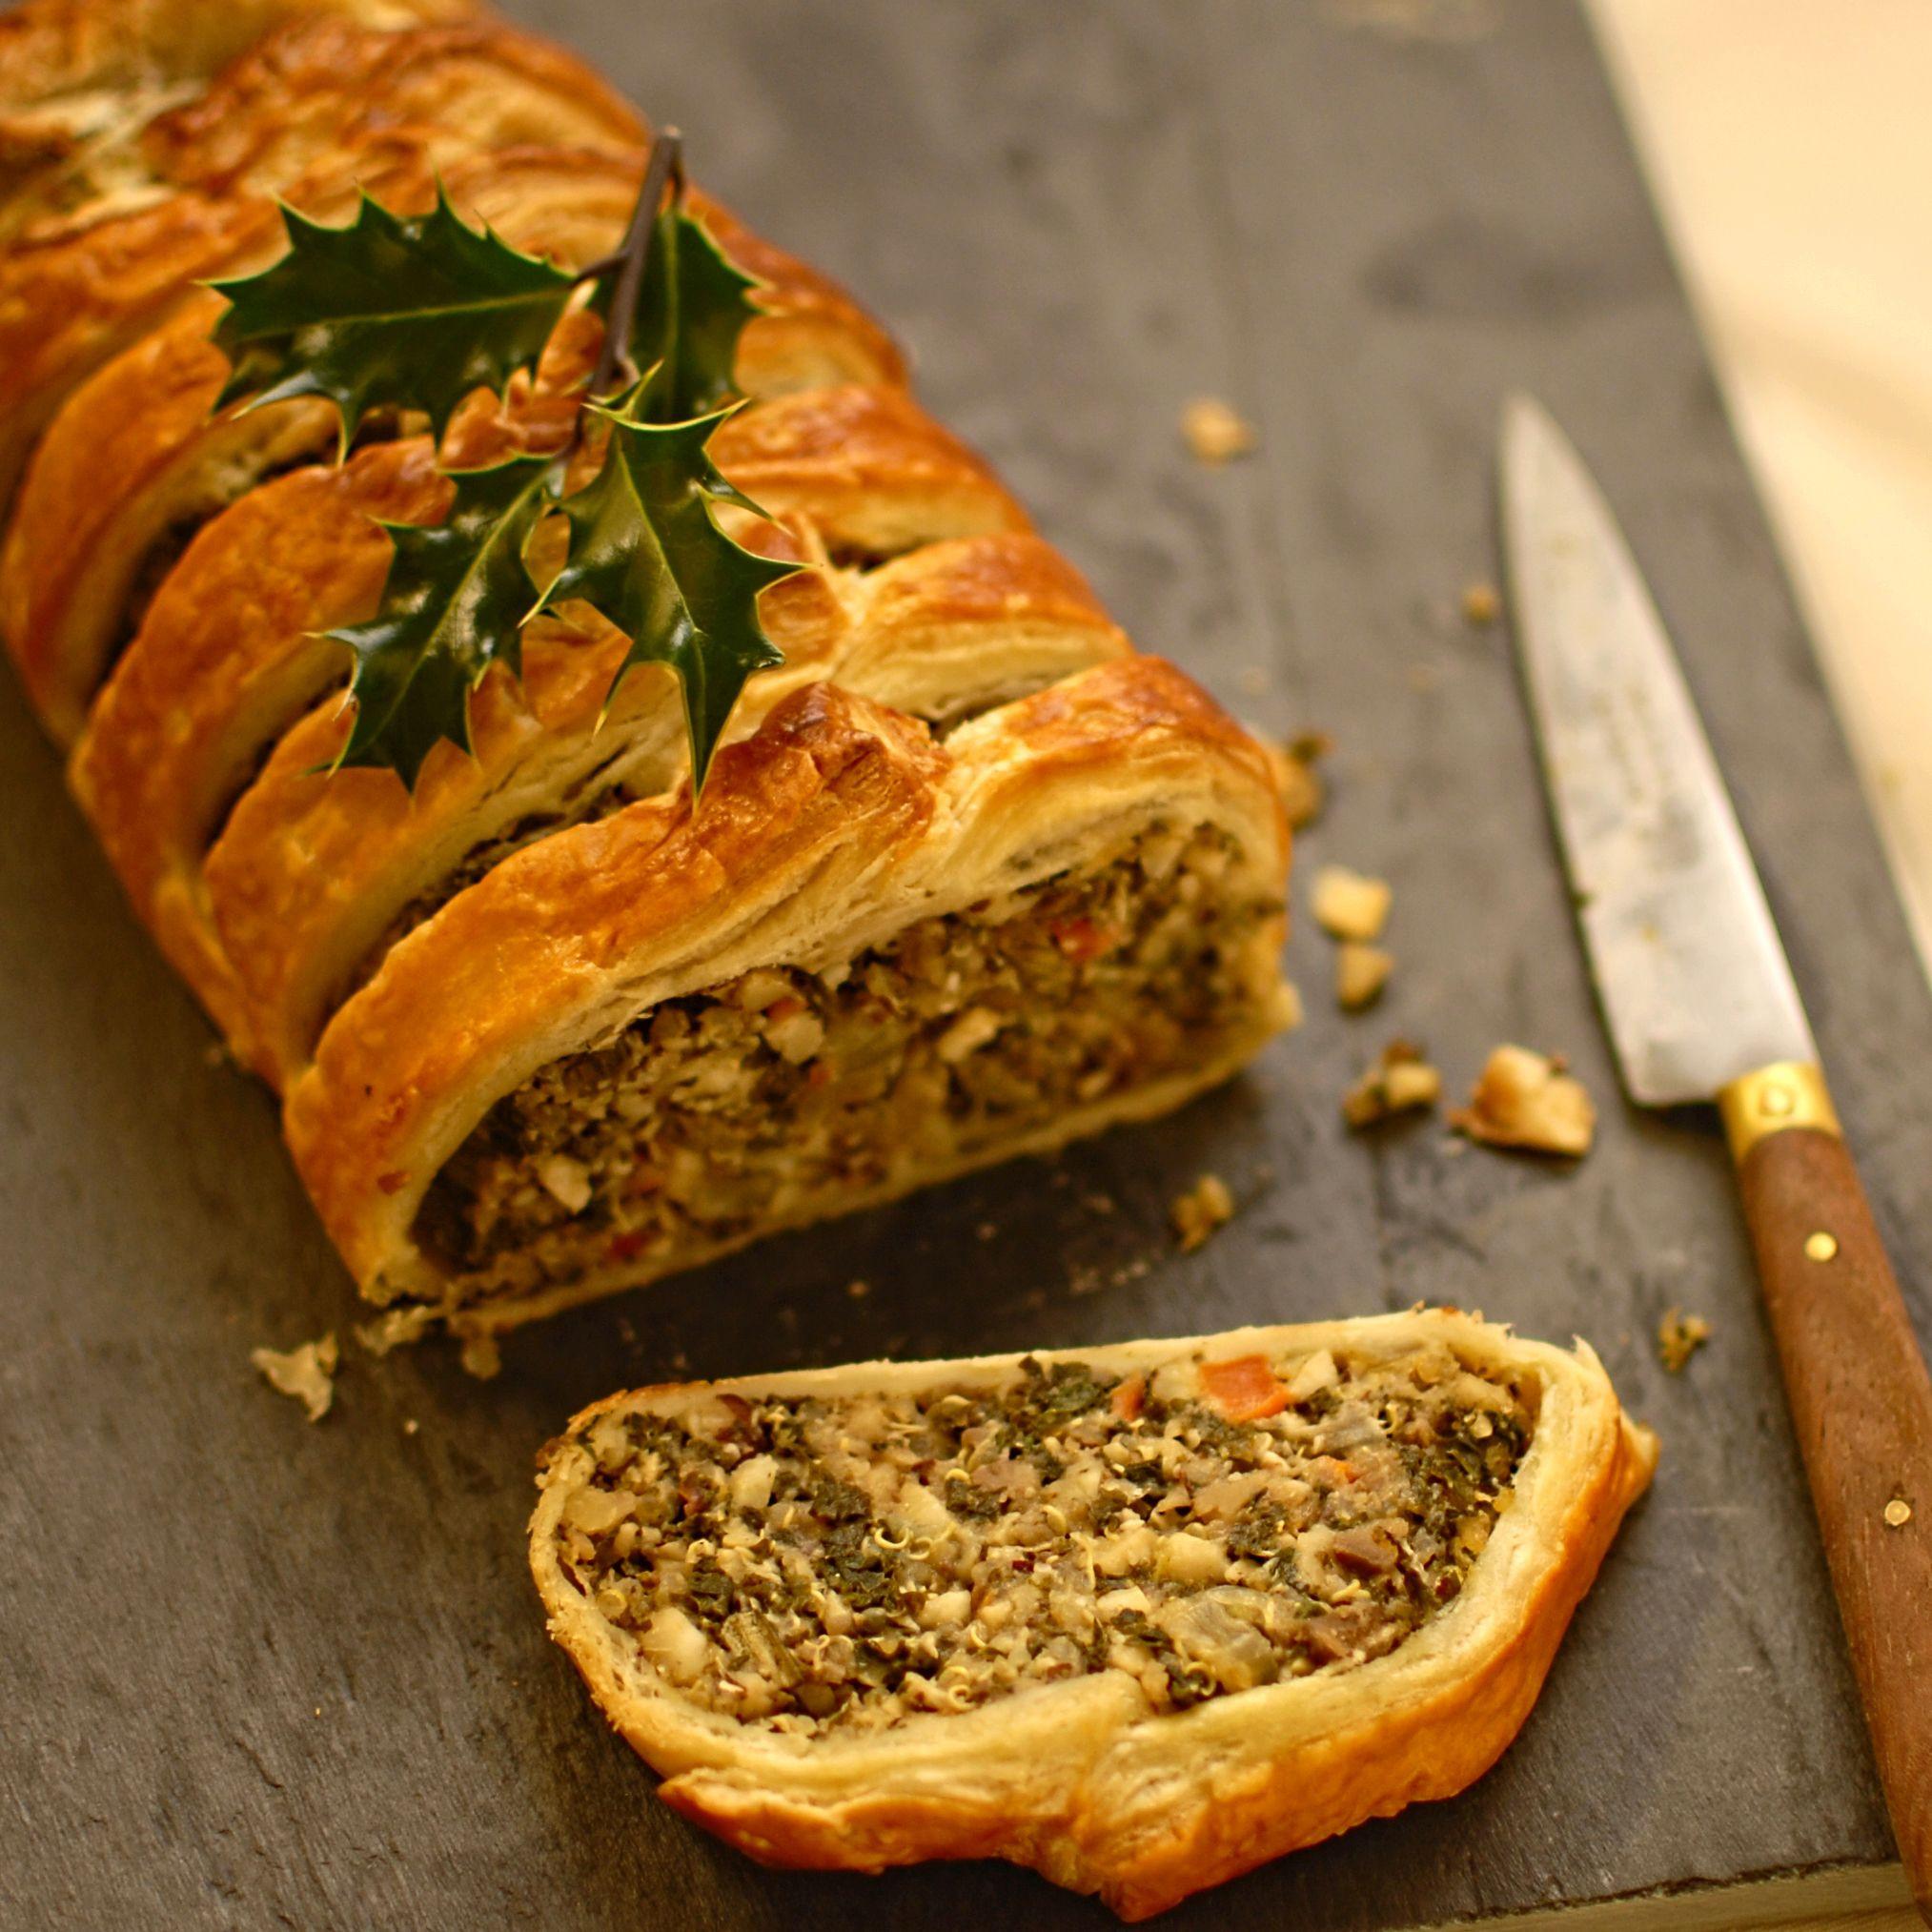 Vegan Christmas Recipes  Kale Quinoa and Nut Roast En Croute